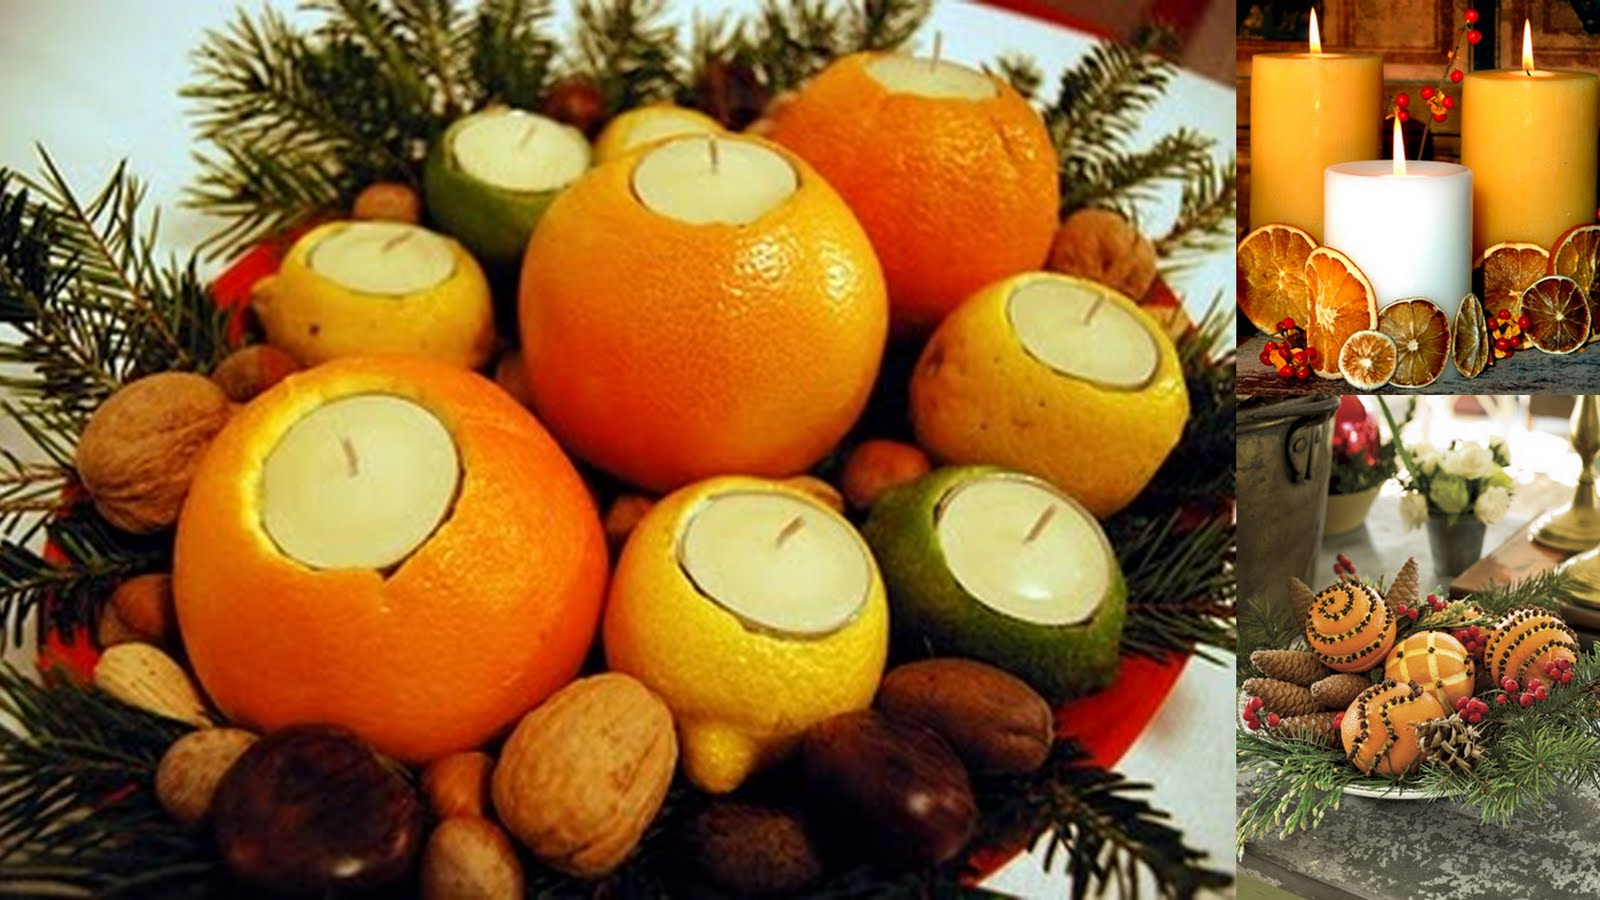 House on ashwell lane use fruit to decorate for Baking oranges for christmas decoration